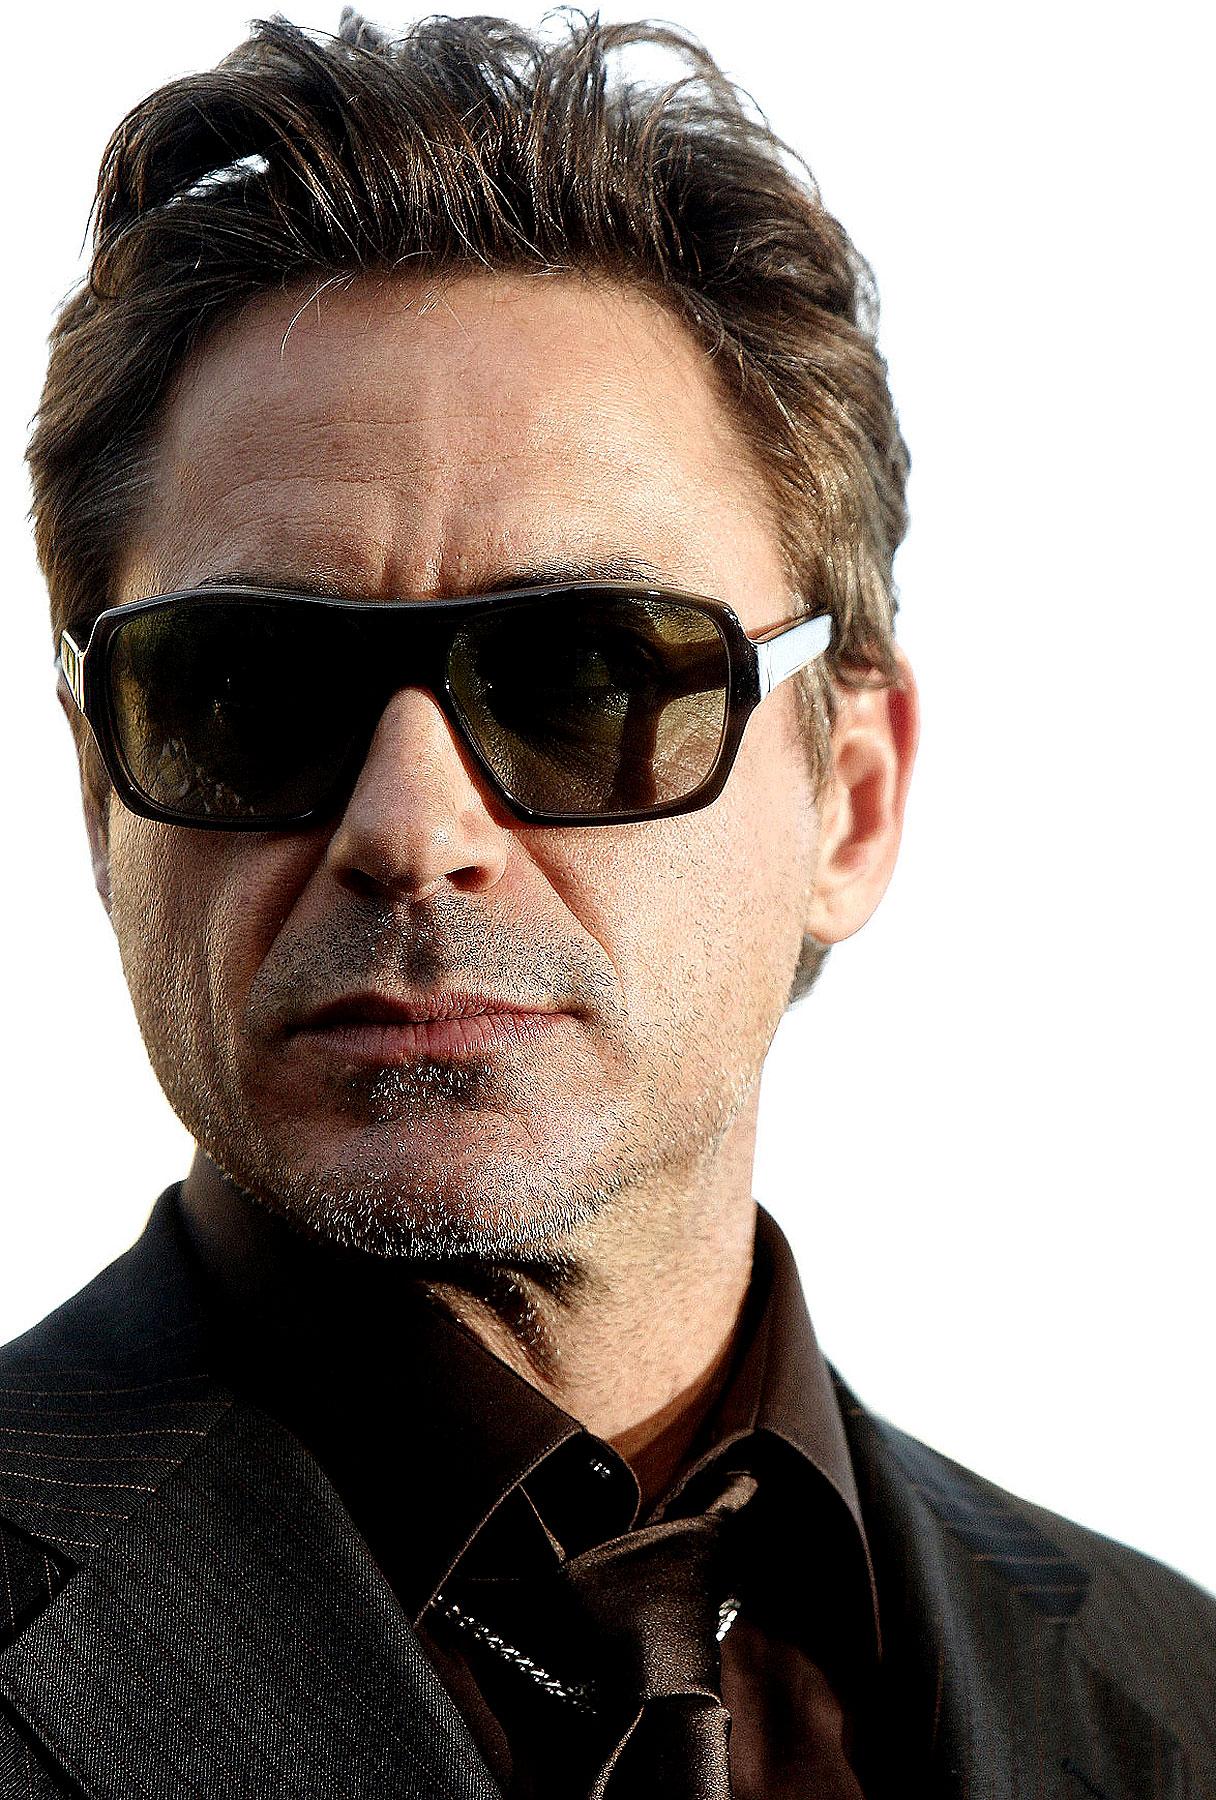 Robert Downey Jr. Sinking His Teeth Into the Vampire Chronicles?